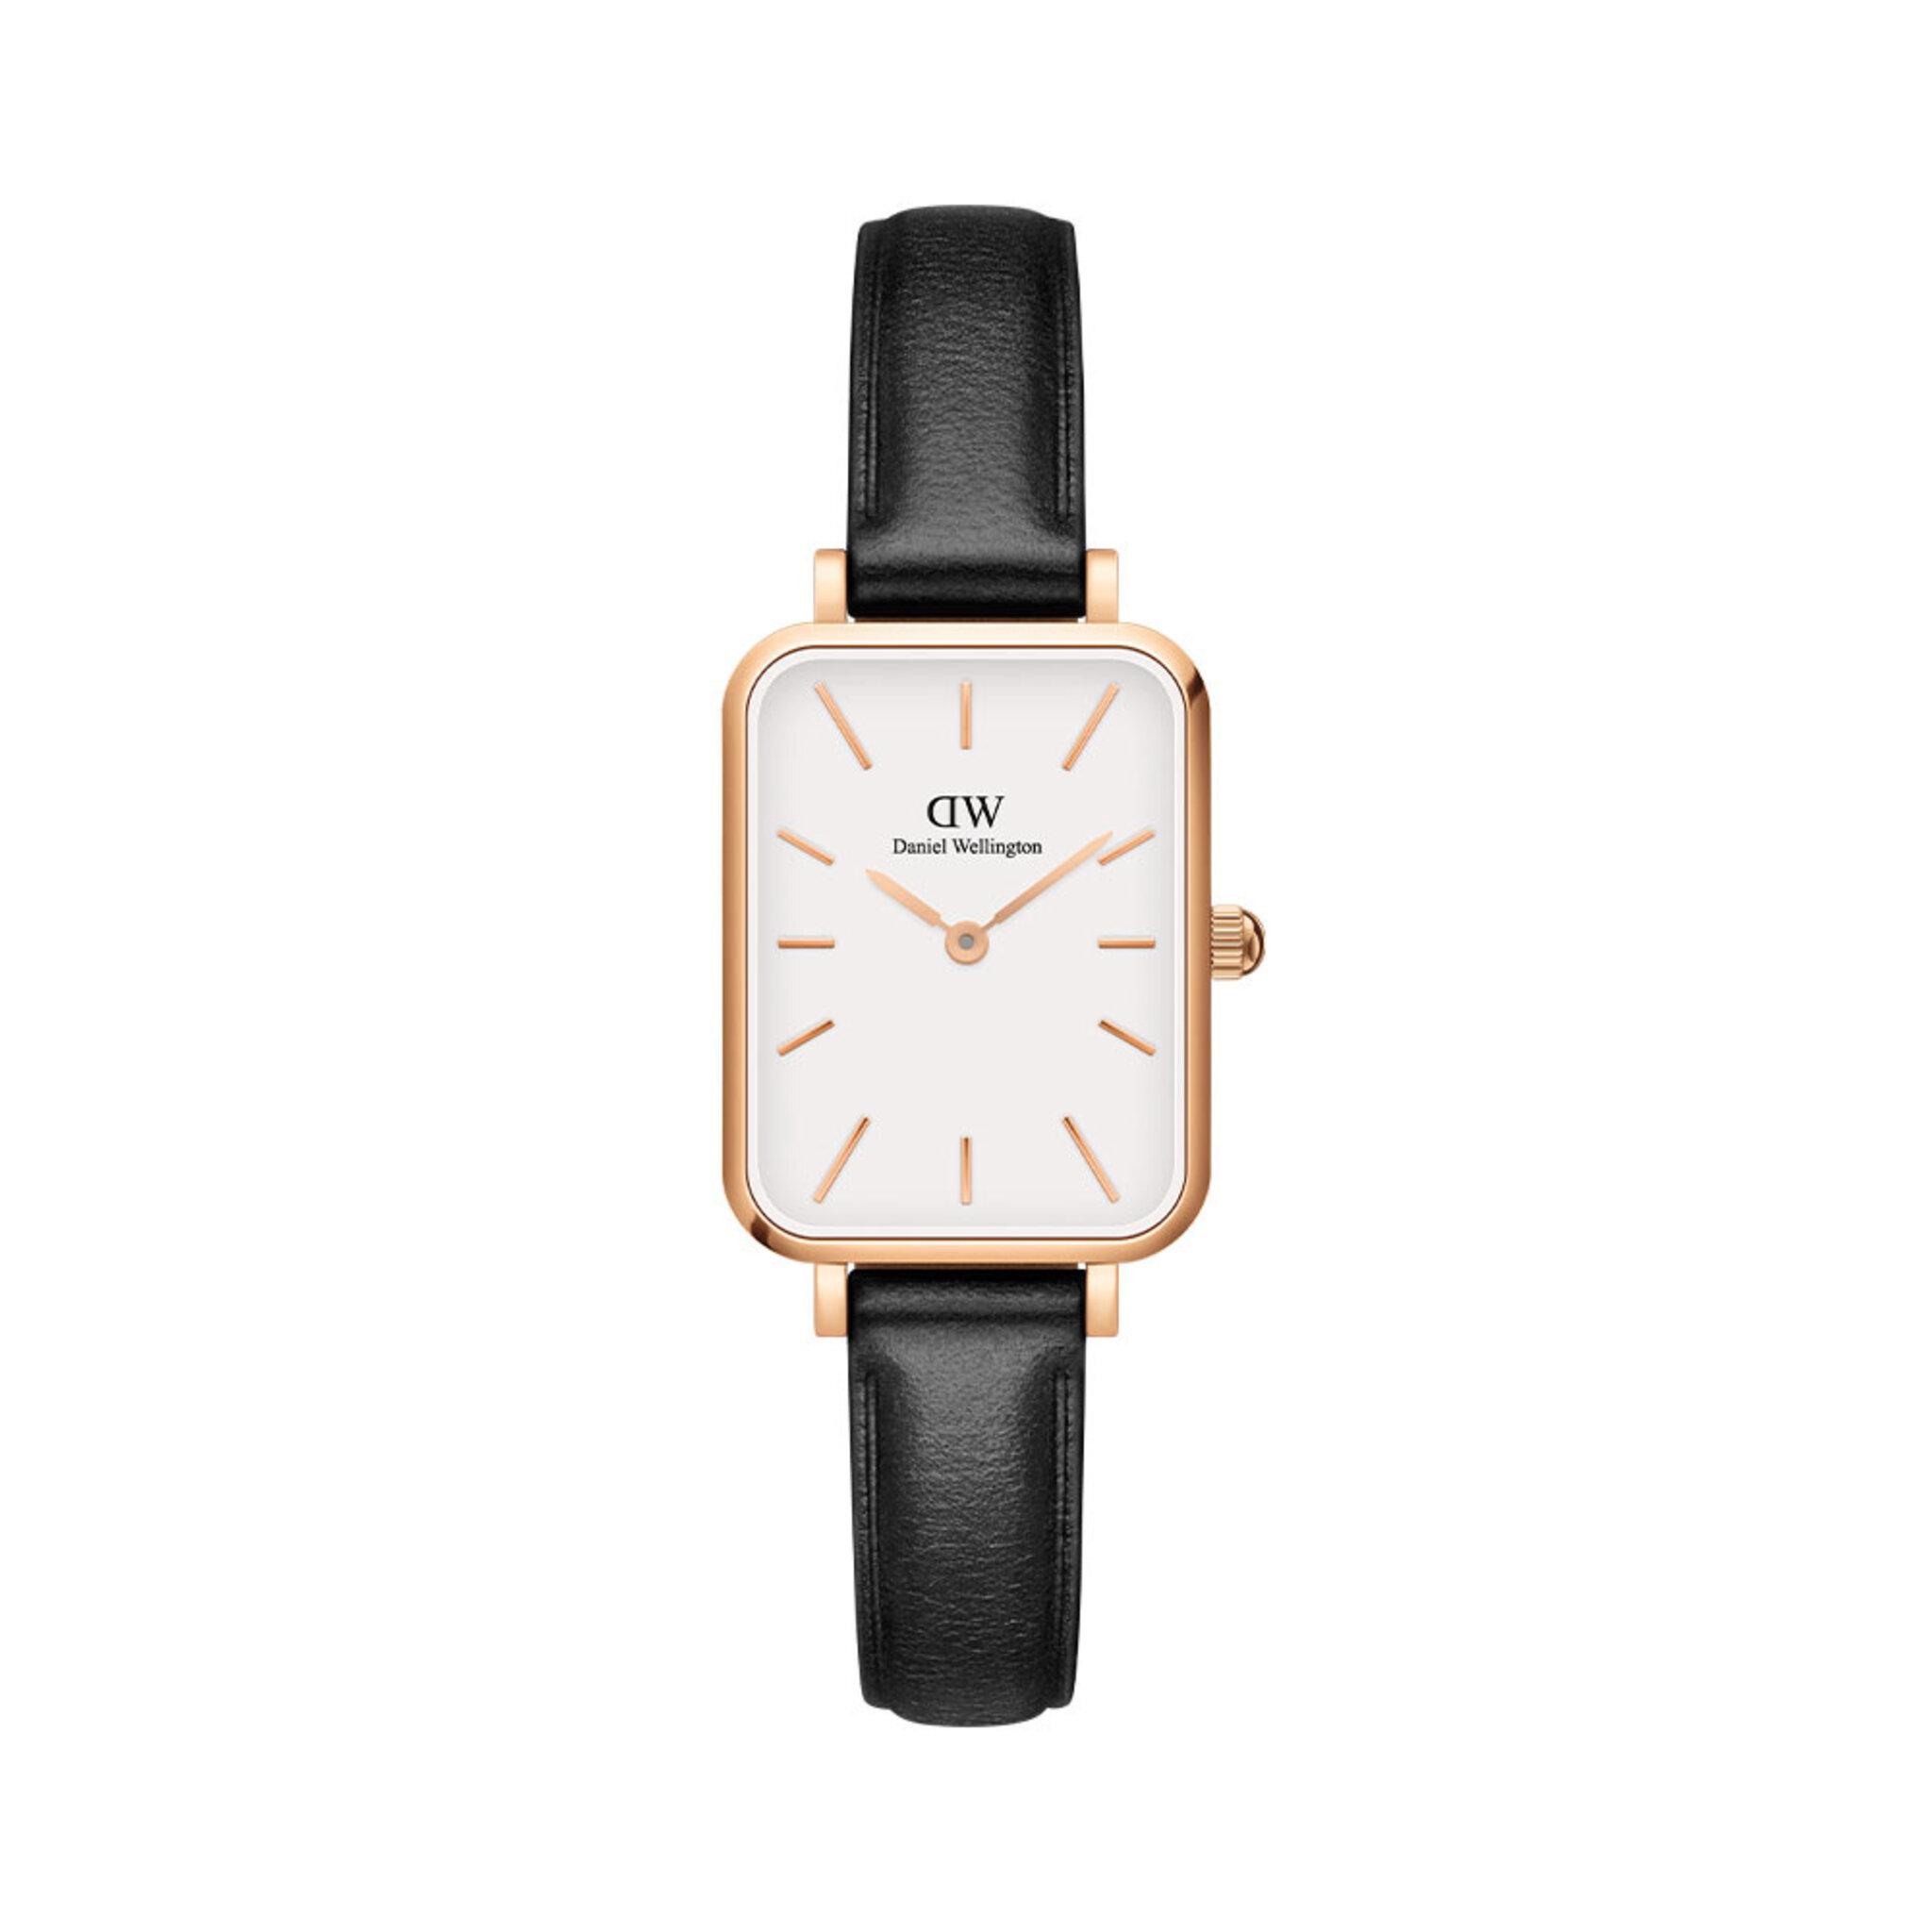 Petite Quadro Pressed Sheffield Watch, 20x26 mm